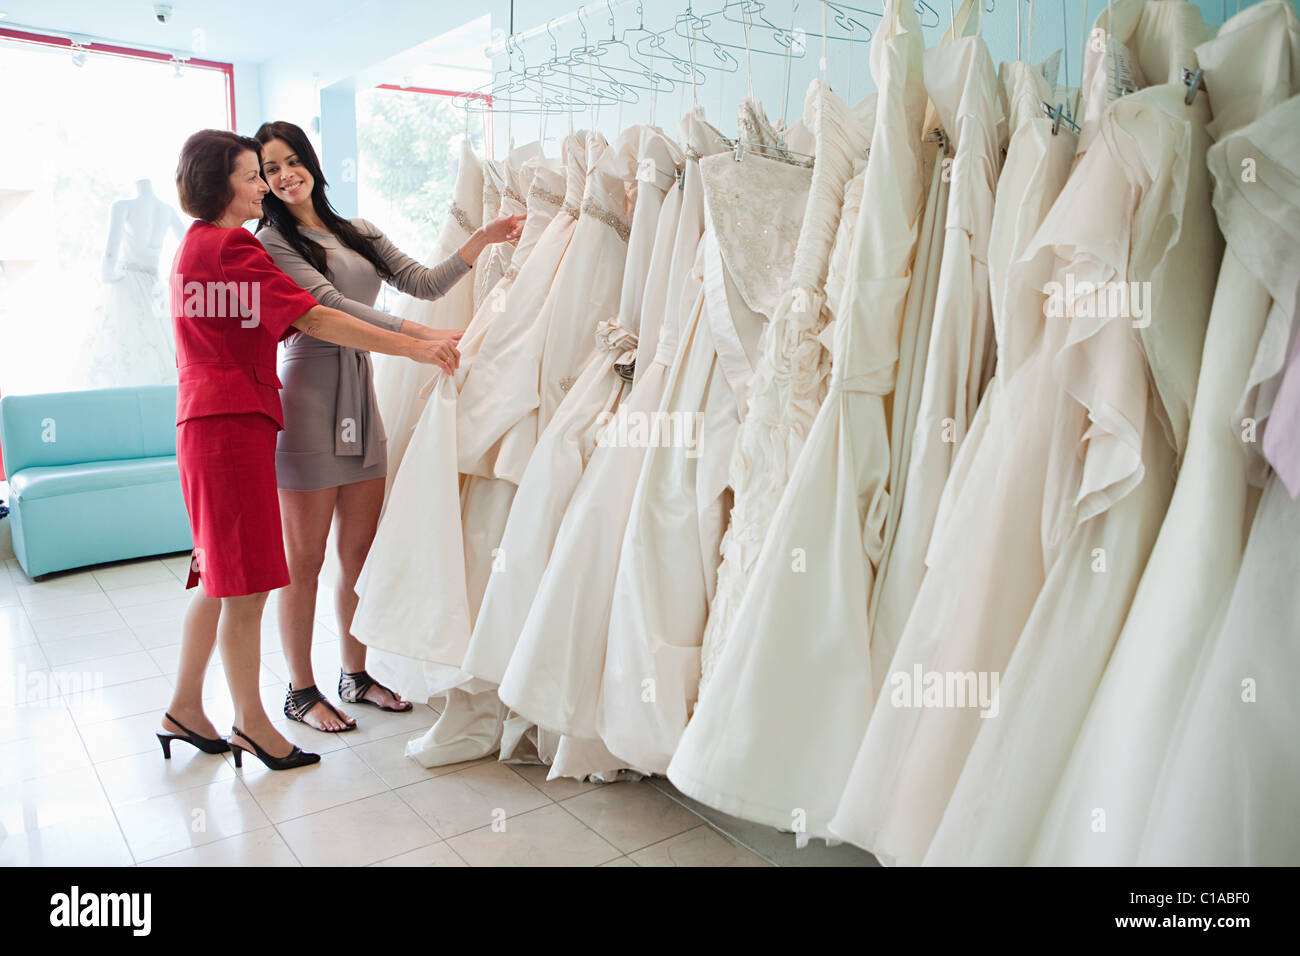 Hispanic Dresses Stockfotos & Hispanic Dresses Bilder - Alamy